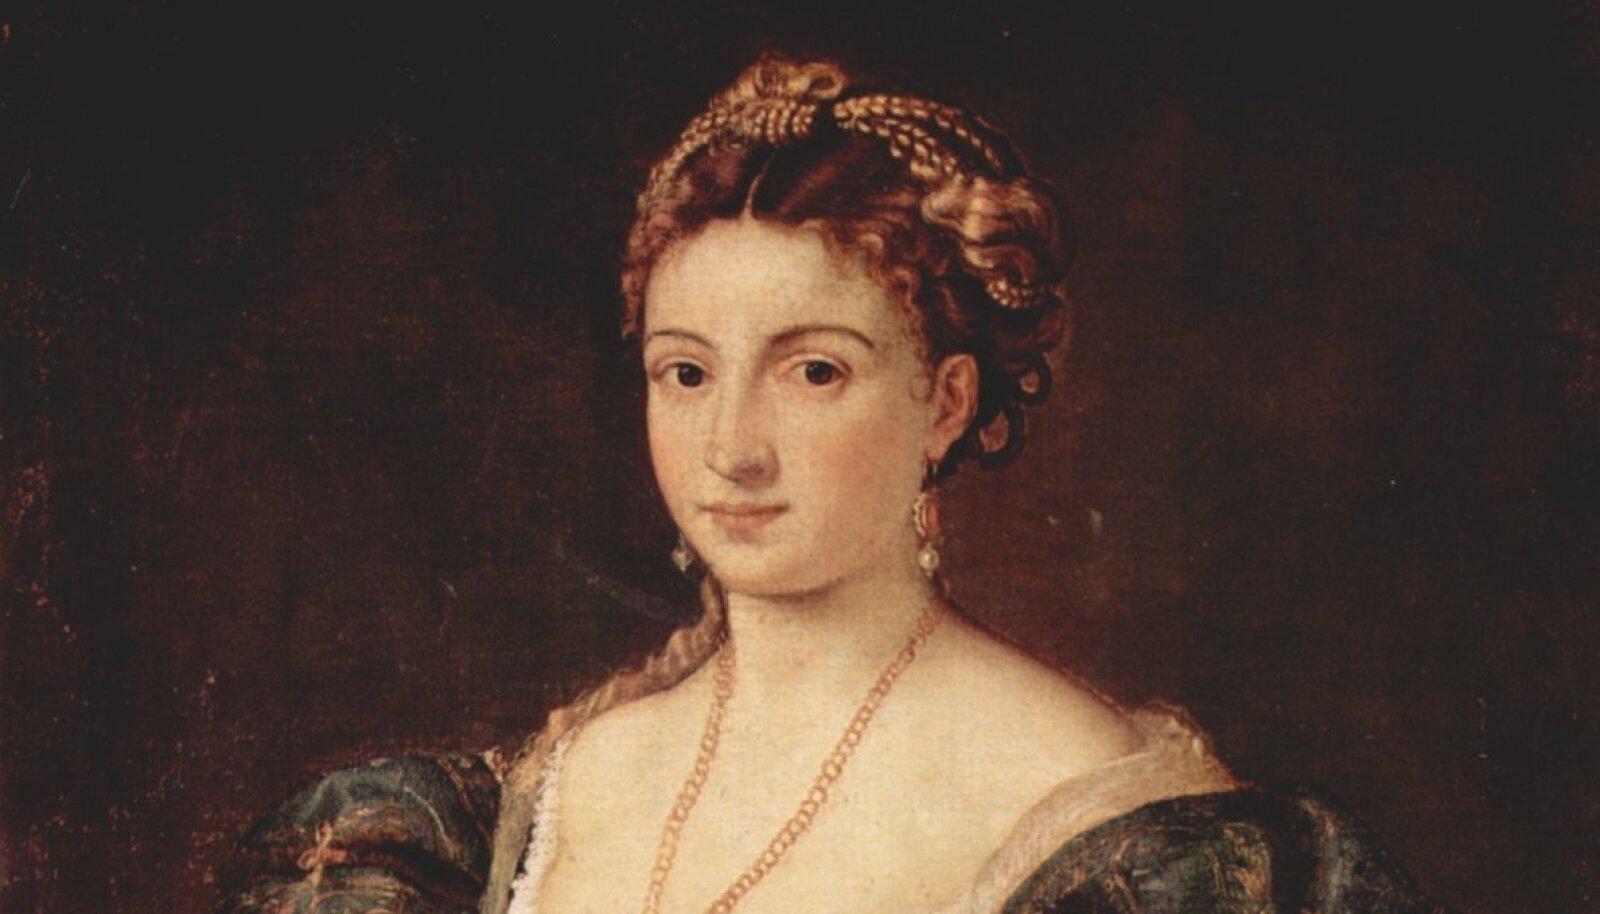 Romaani käivitab fiktiivse Tiziani maali leidmine.